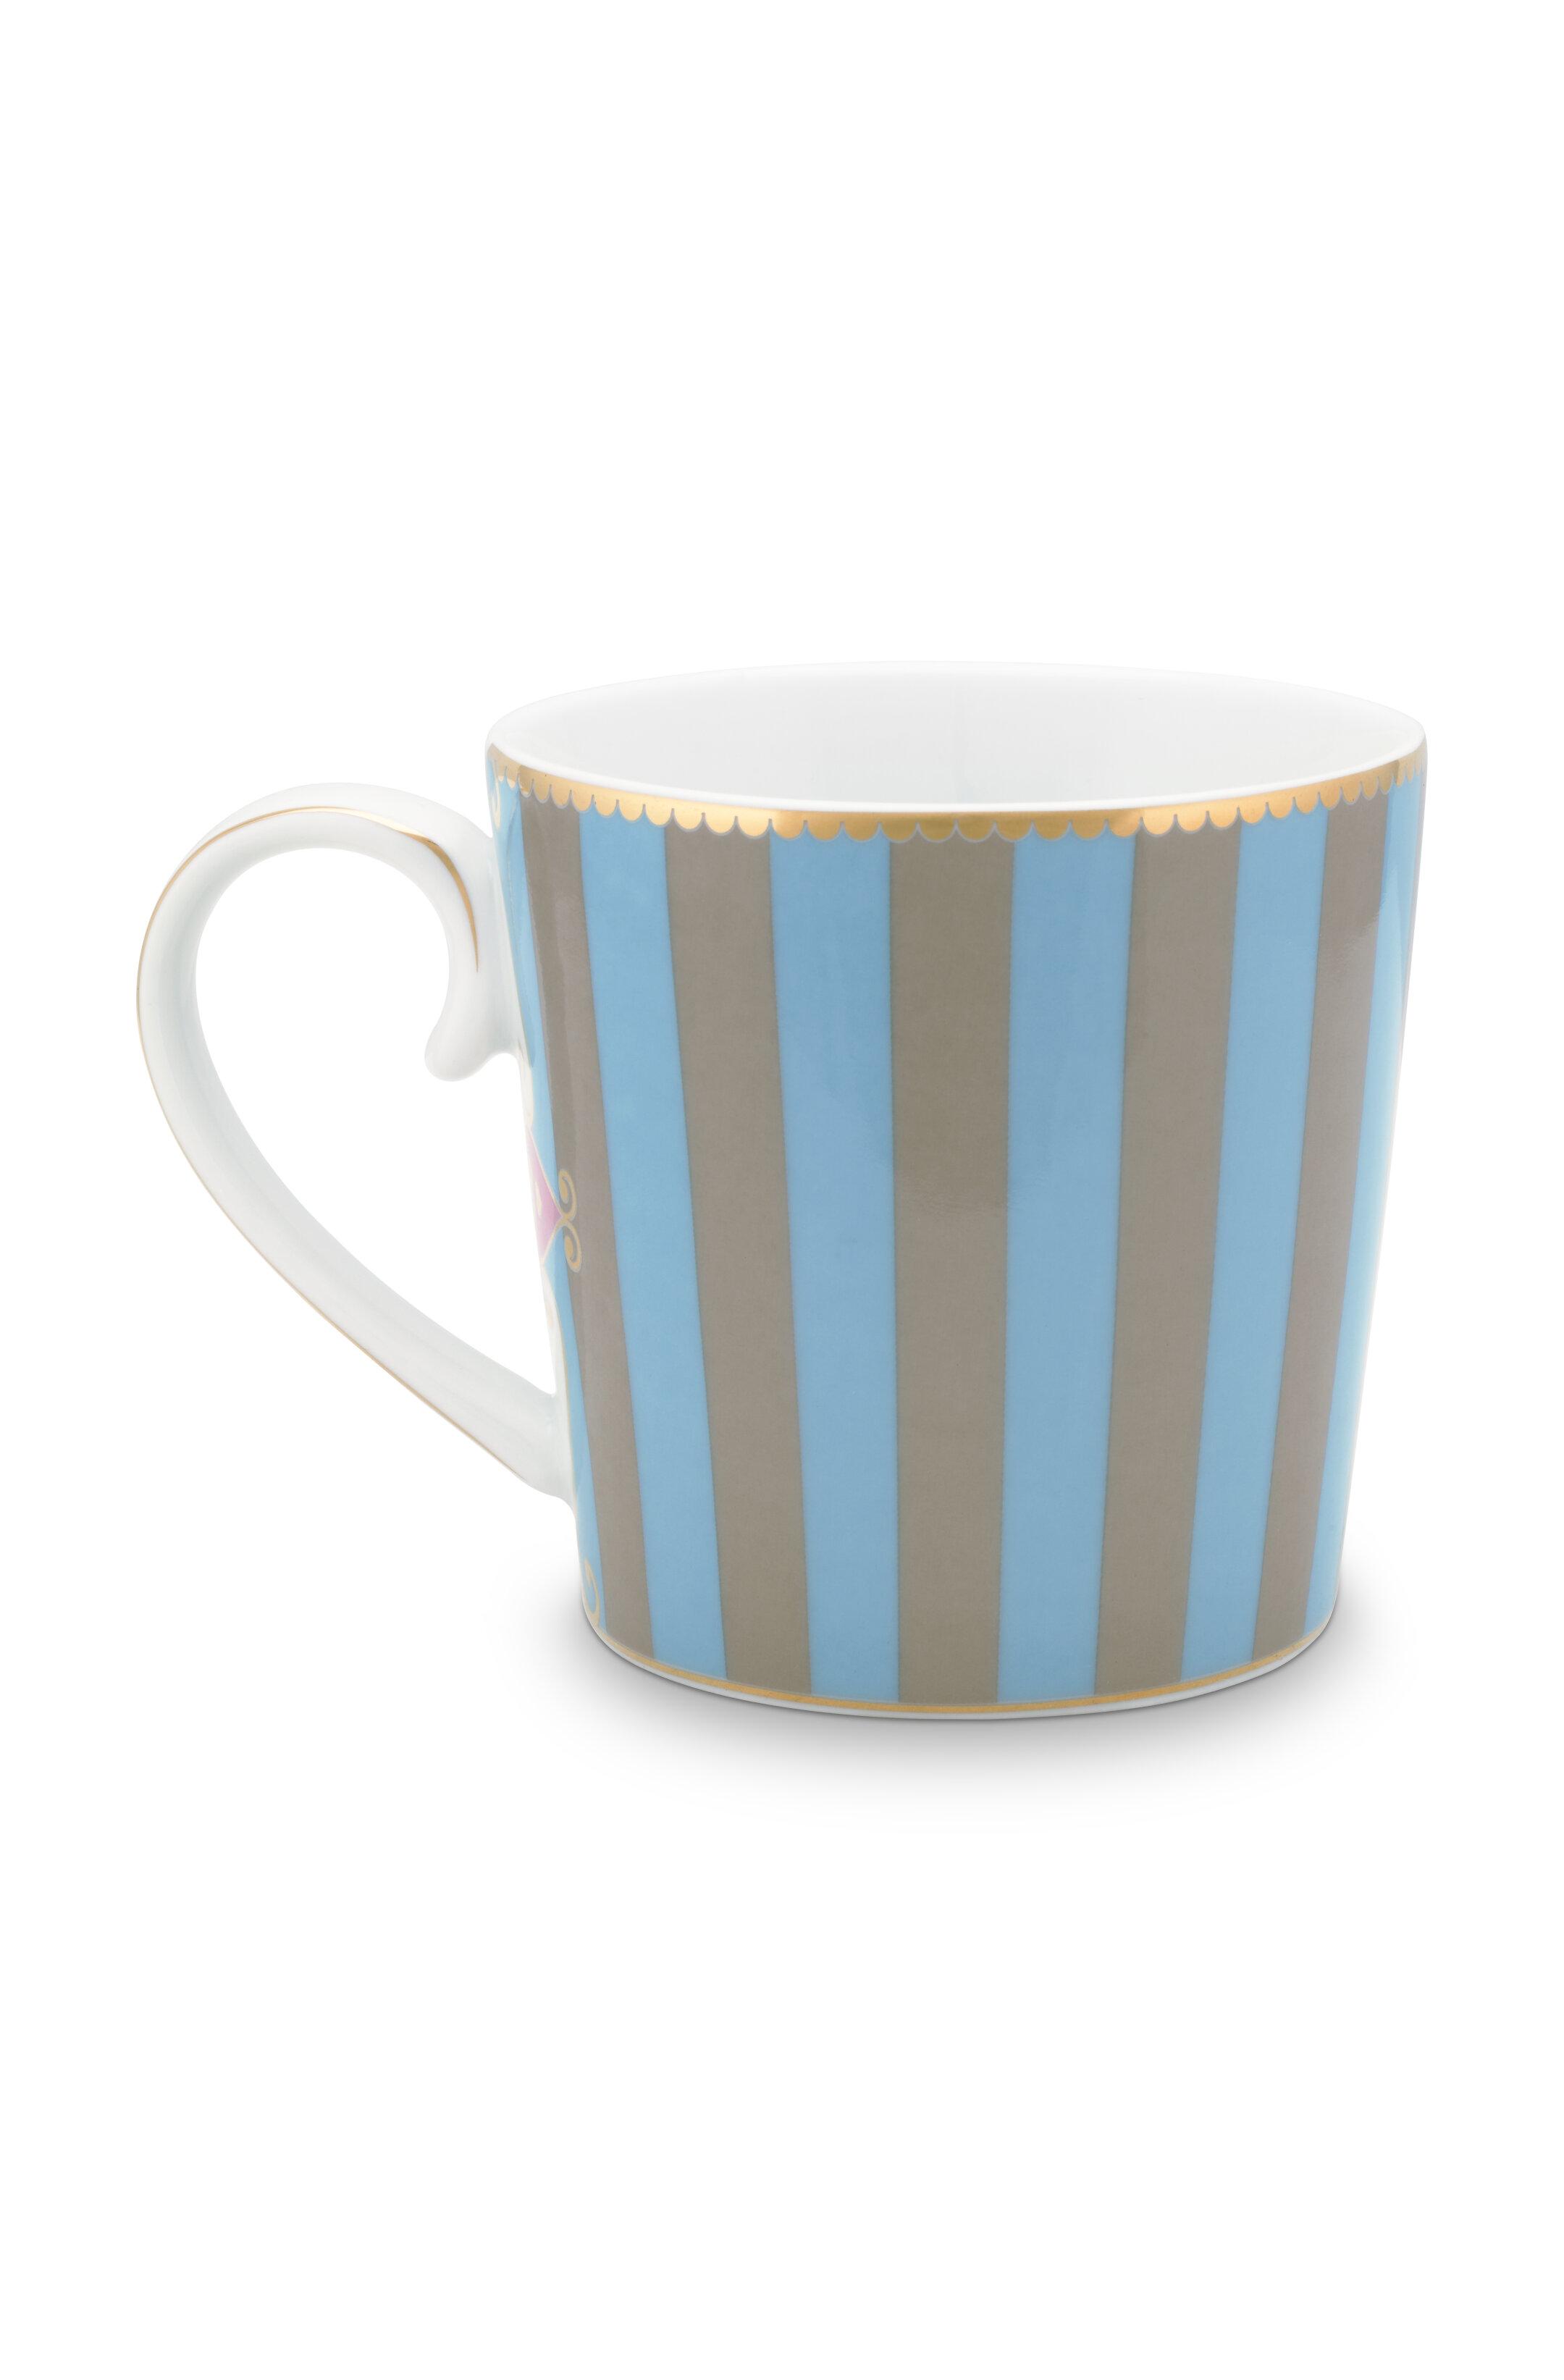 Pip Studio Love Birds Tasse Groß Stripes Blau-Khaki